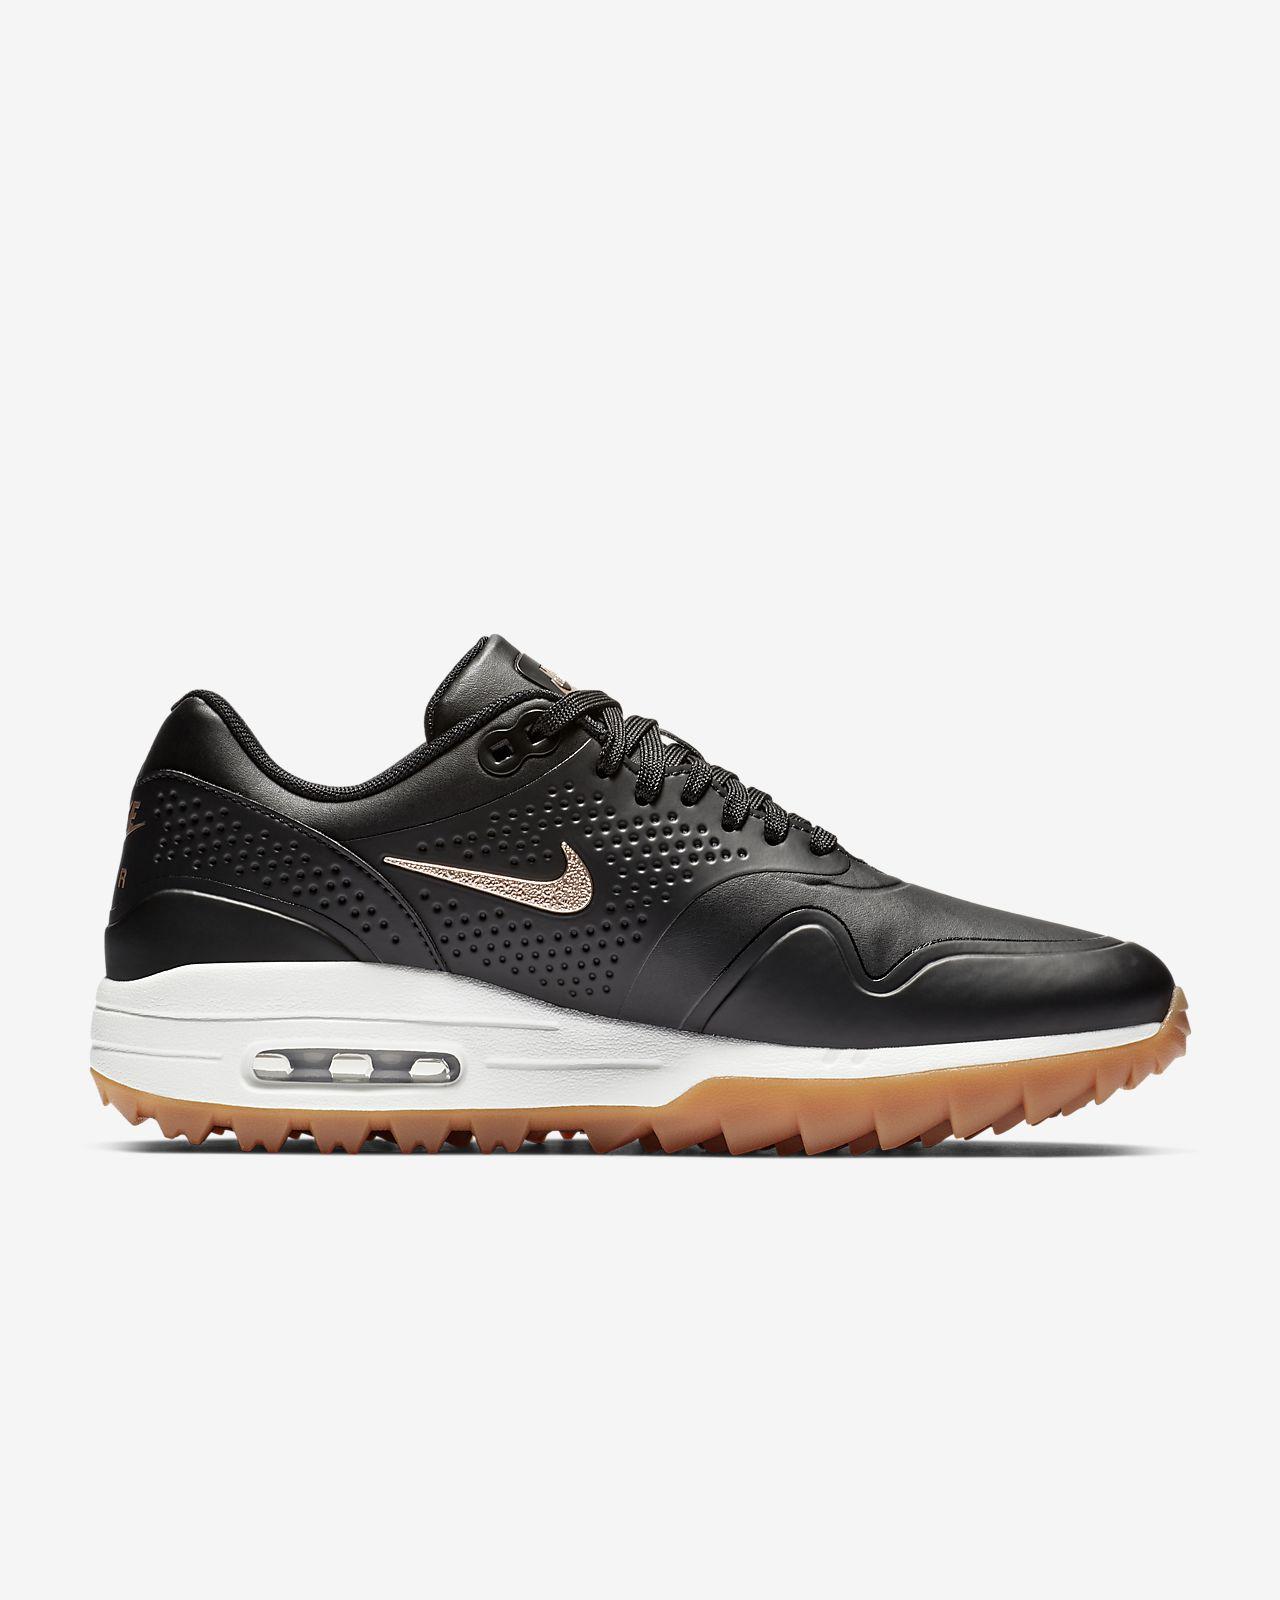 e14d3ae237d8 Nike Air Max 1 G Women s Golf Shoe. Nike.com CA